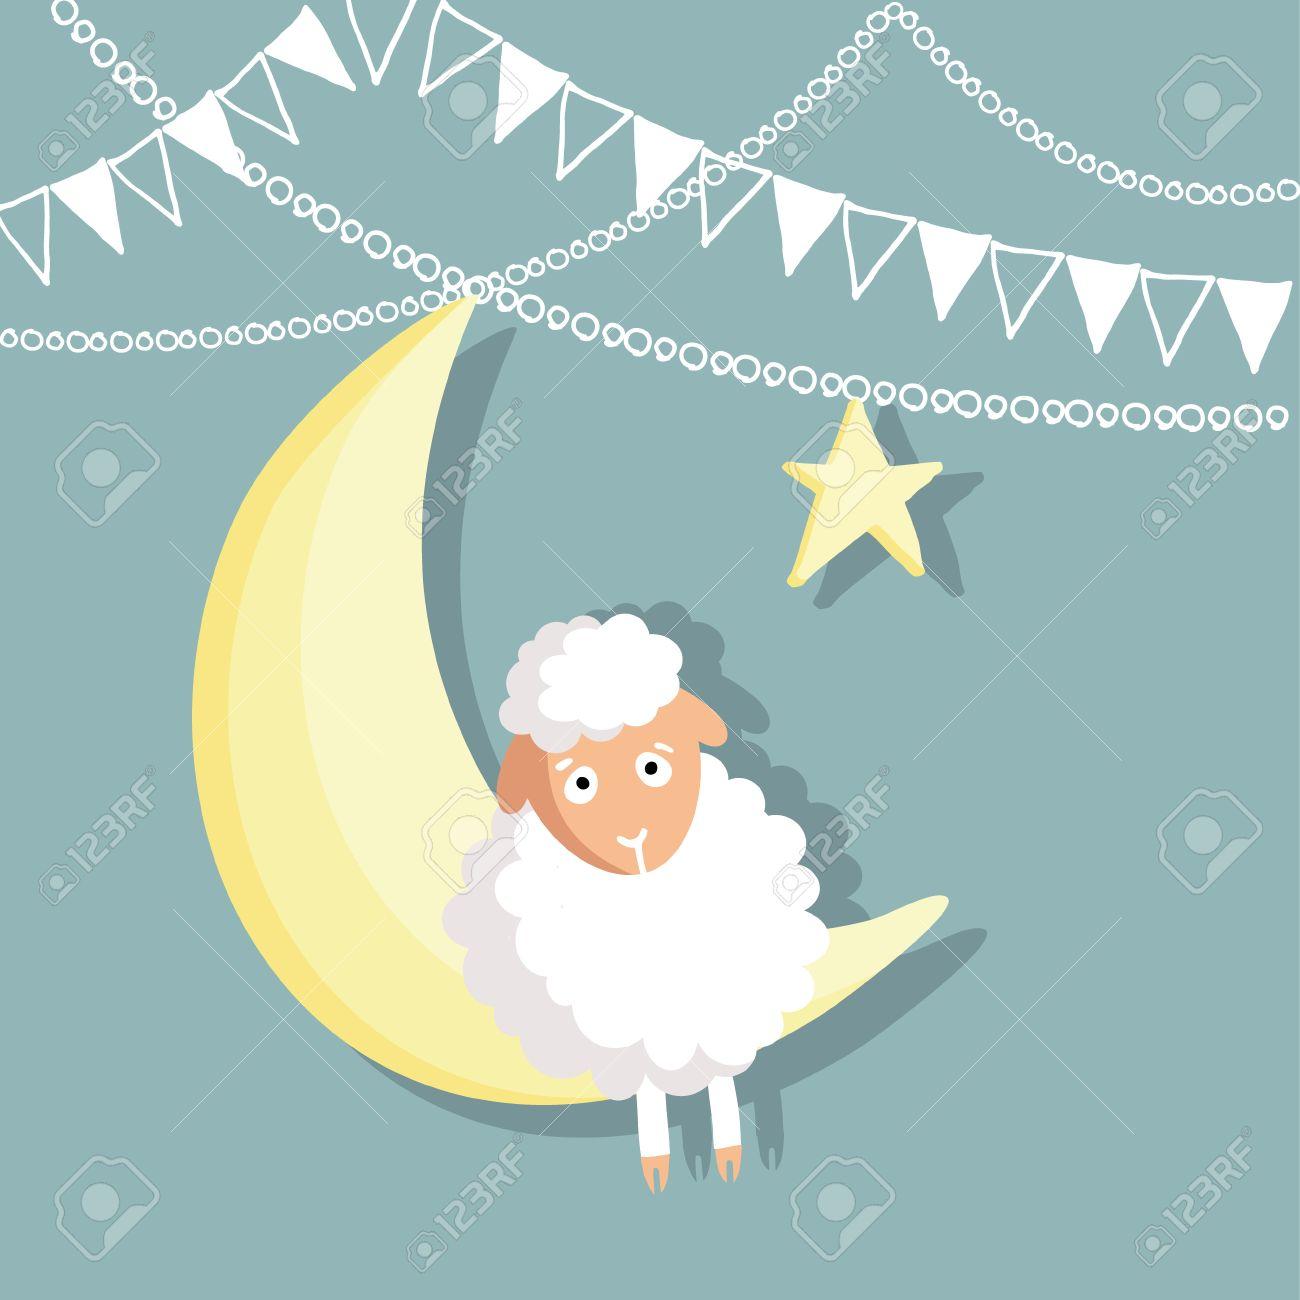 Eid Ul Adha Greeting Card With Sheep Moon Star And Flags Muslim